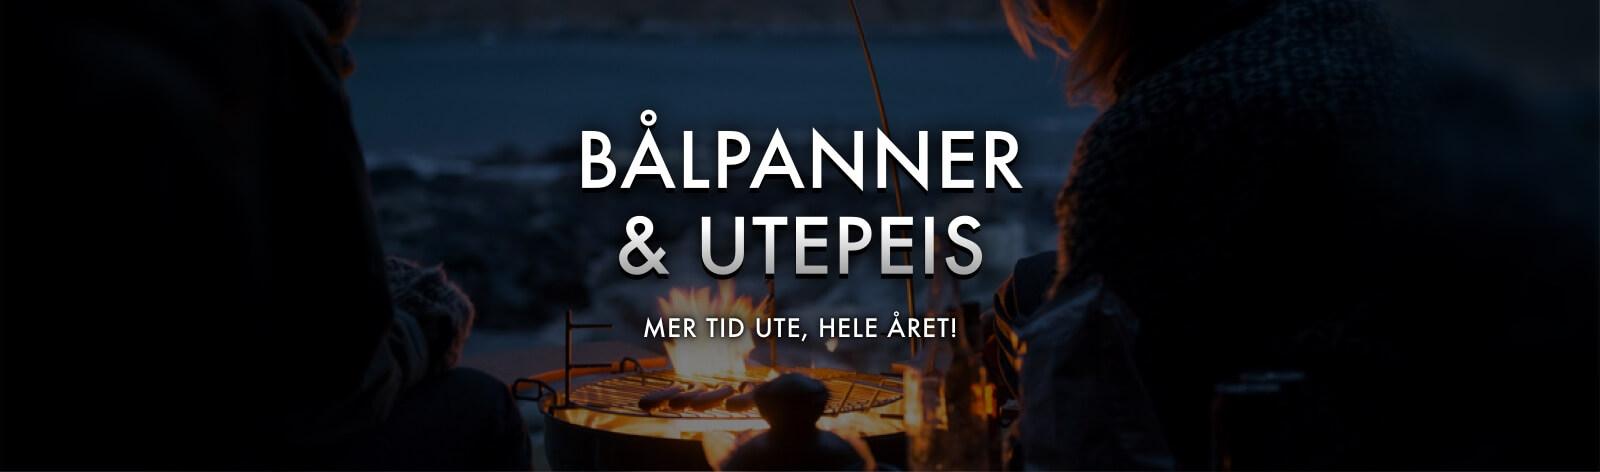 BÅLPANNE & UTEPEIS